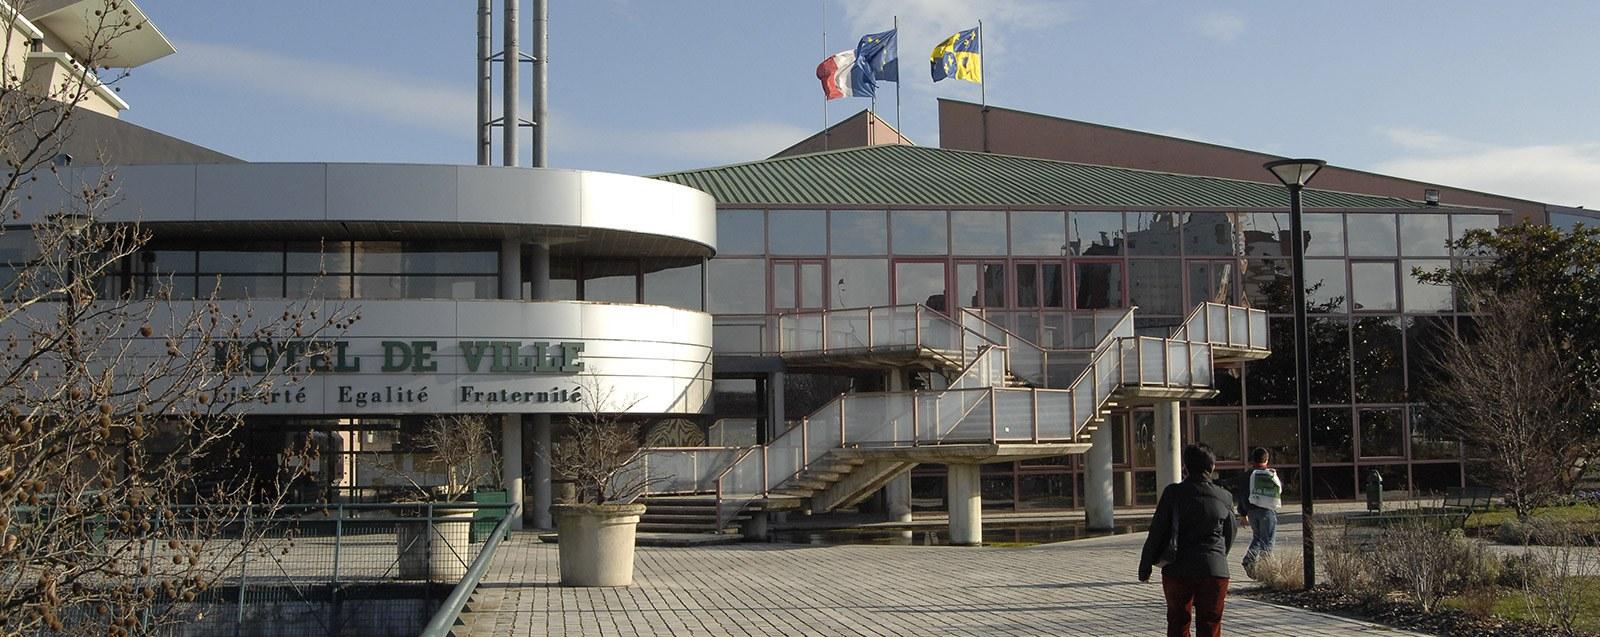 Mairie Villefontaine services